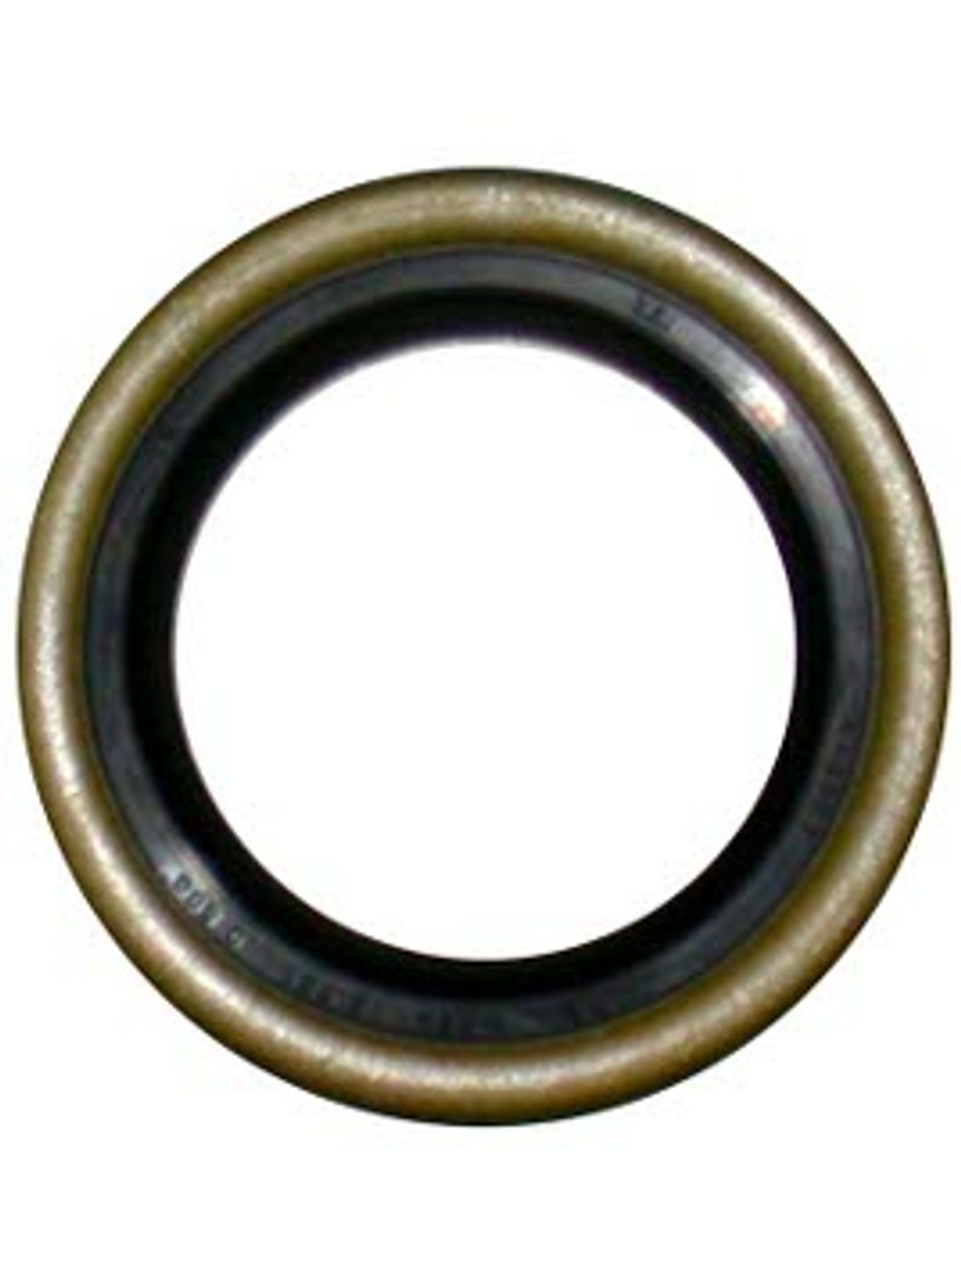 "GS1041 --- Grease Seal - 2.544"" Outer Diameter - 1.94"" Inner Diameter"